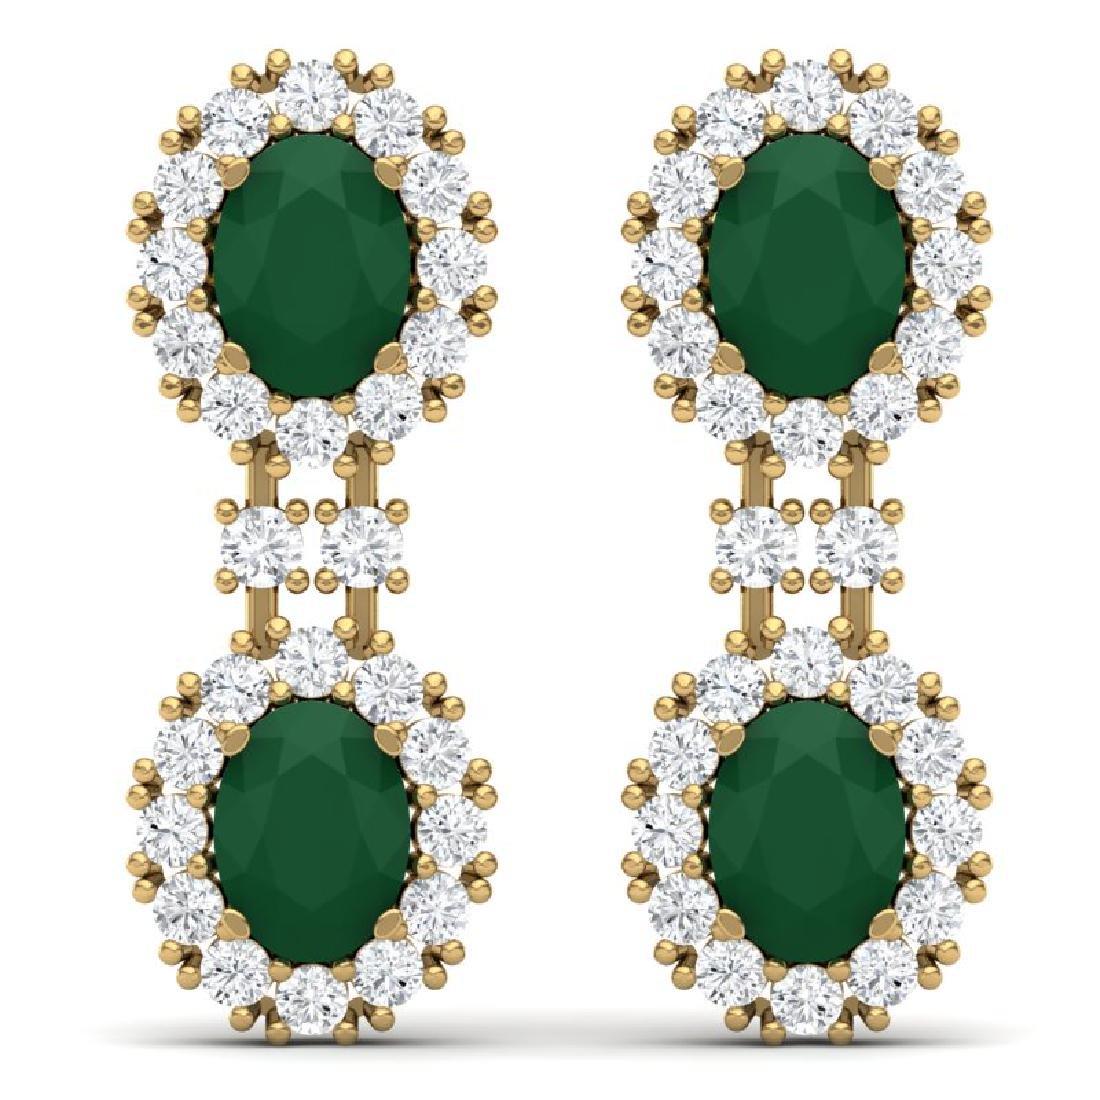 8.98 CTW Royalty Emerald & VS Diamond Earrings 18K